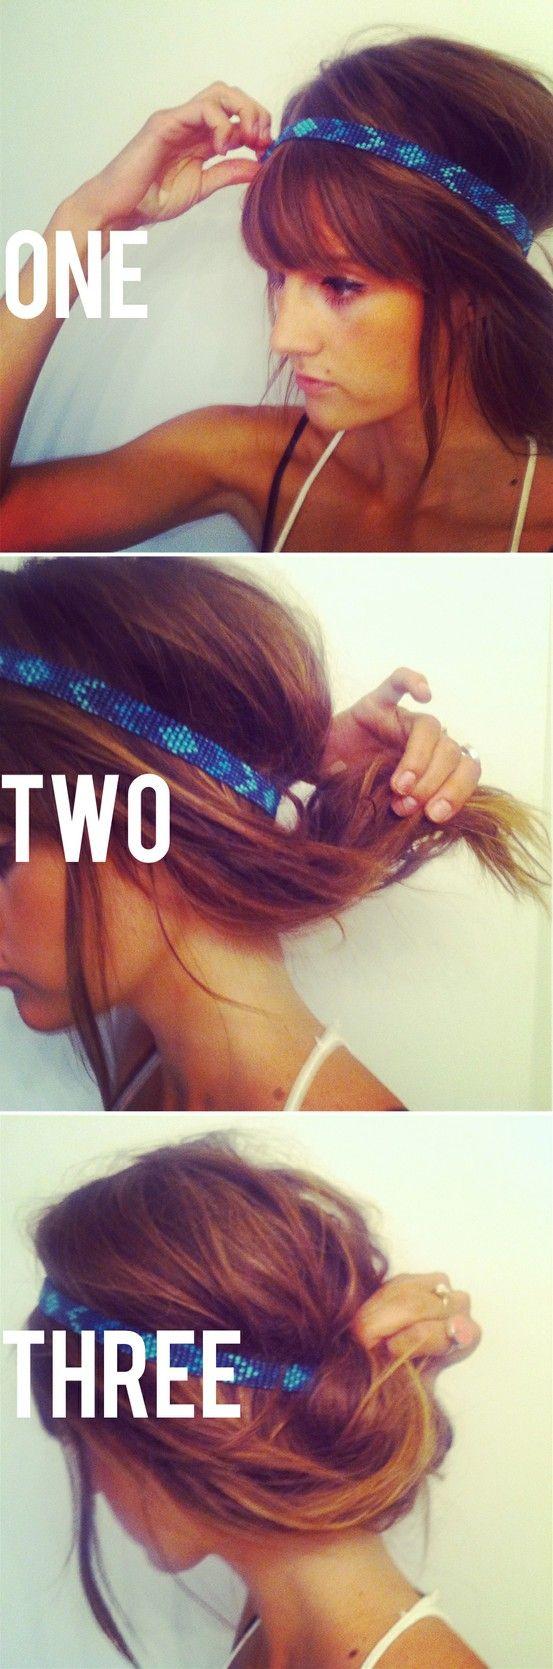 Beach ready: Hair Ideas, Boho Chic, Head Bands, Summer Hair, Festivals Hair, Hair Style, Headbands, Hair Color, Cute Hairstyles